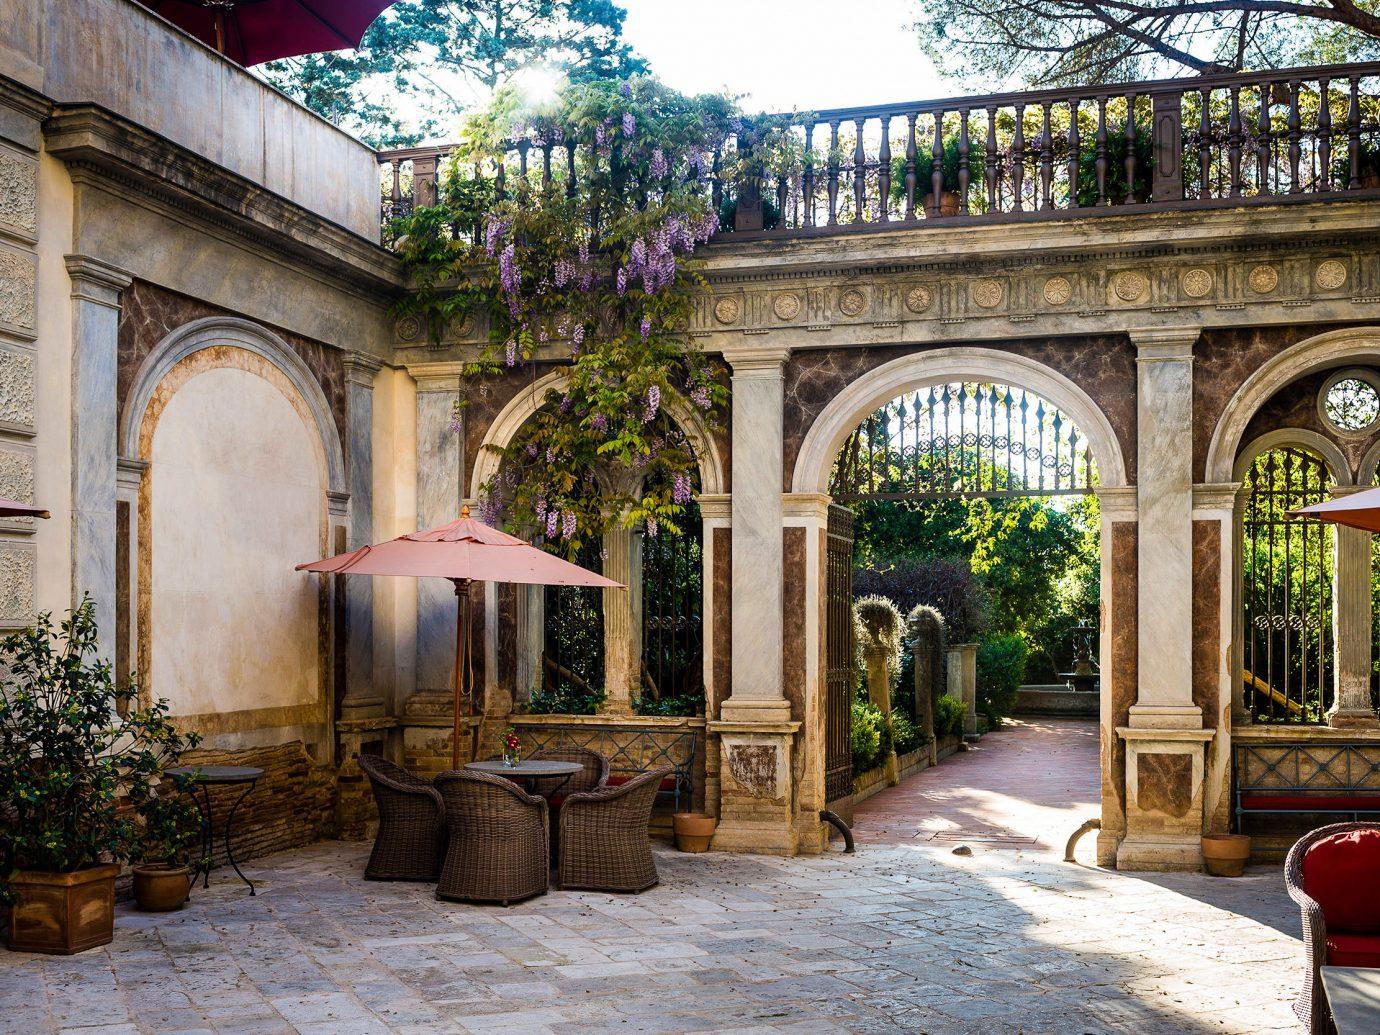 Celebs Hotels Courtyard estate hacienda window real estate outdoor structure Garden arch tree facade Patio orangery